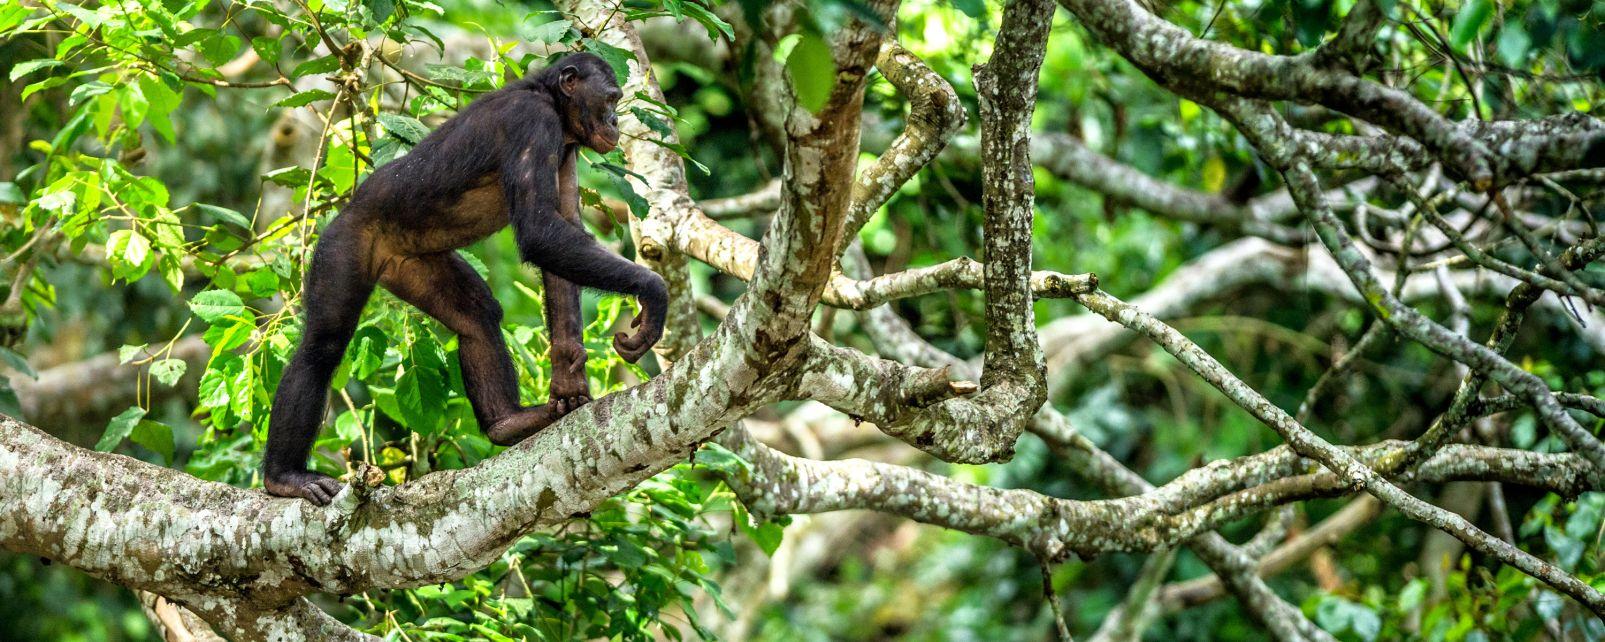 , La flora, La fauna e la flora, Repubblica democratica del Congo